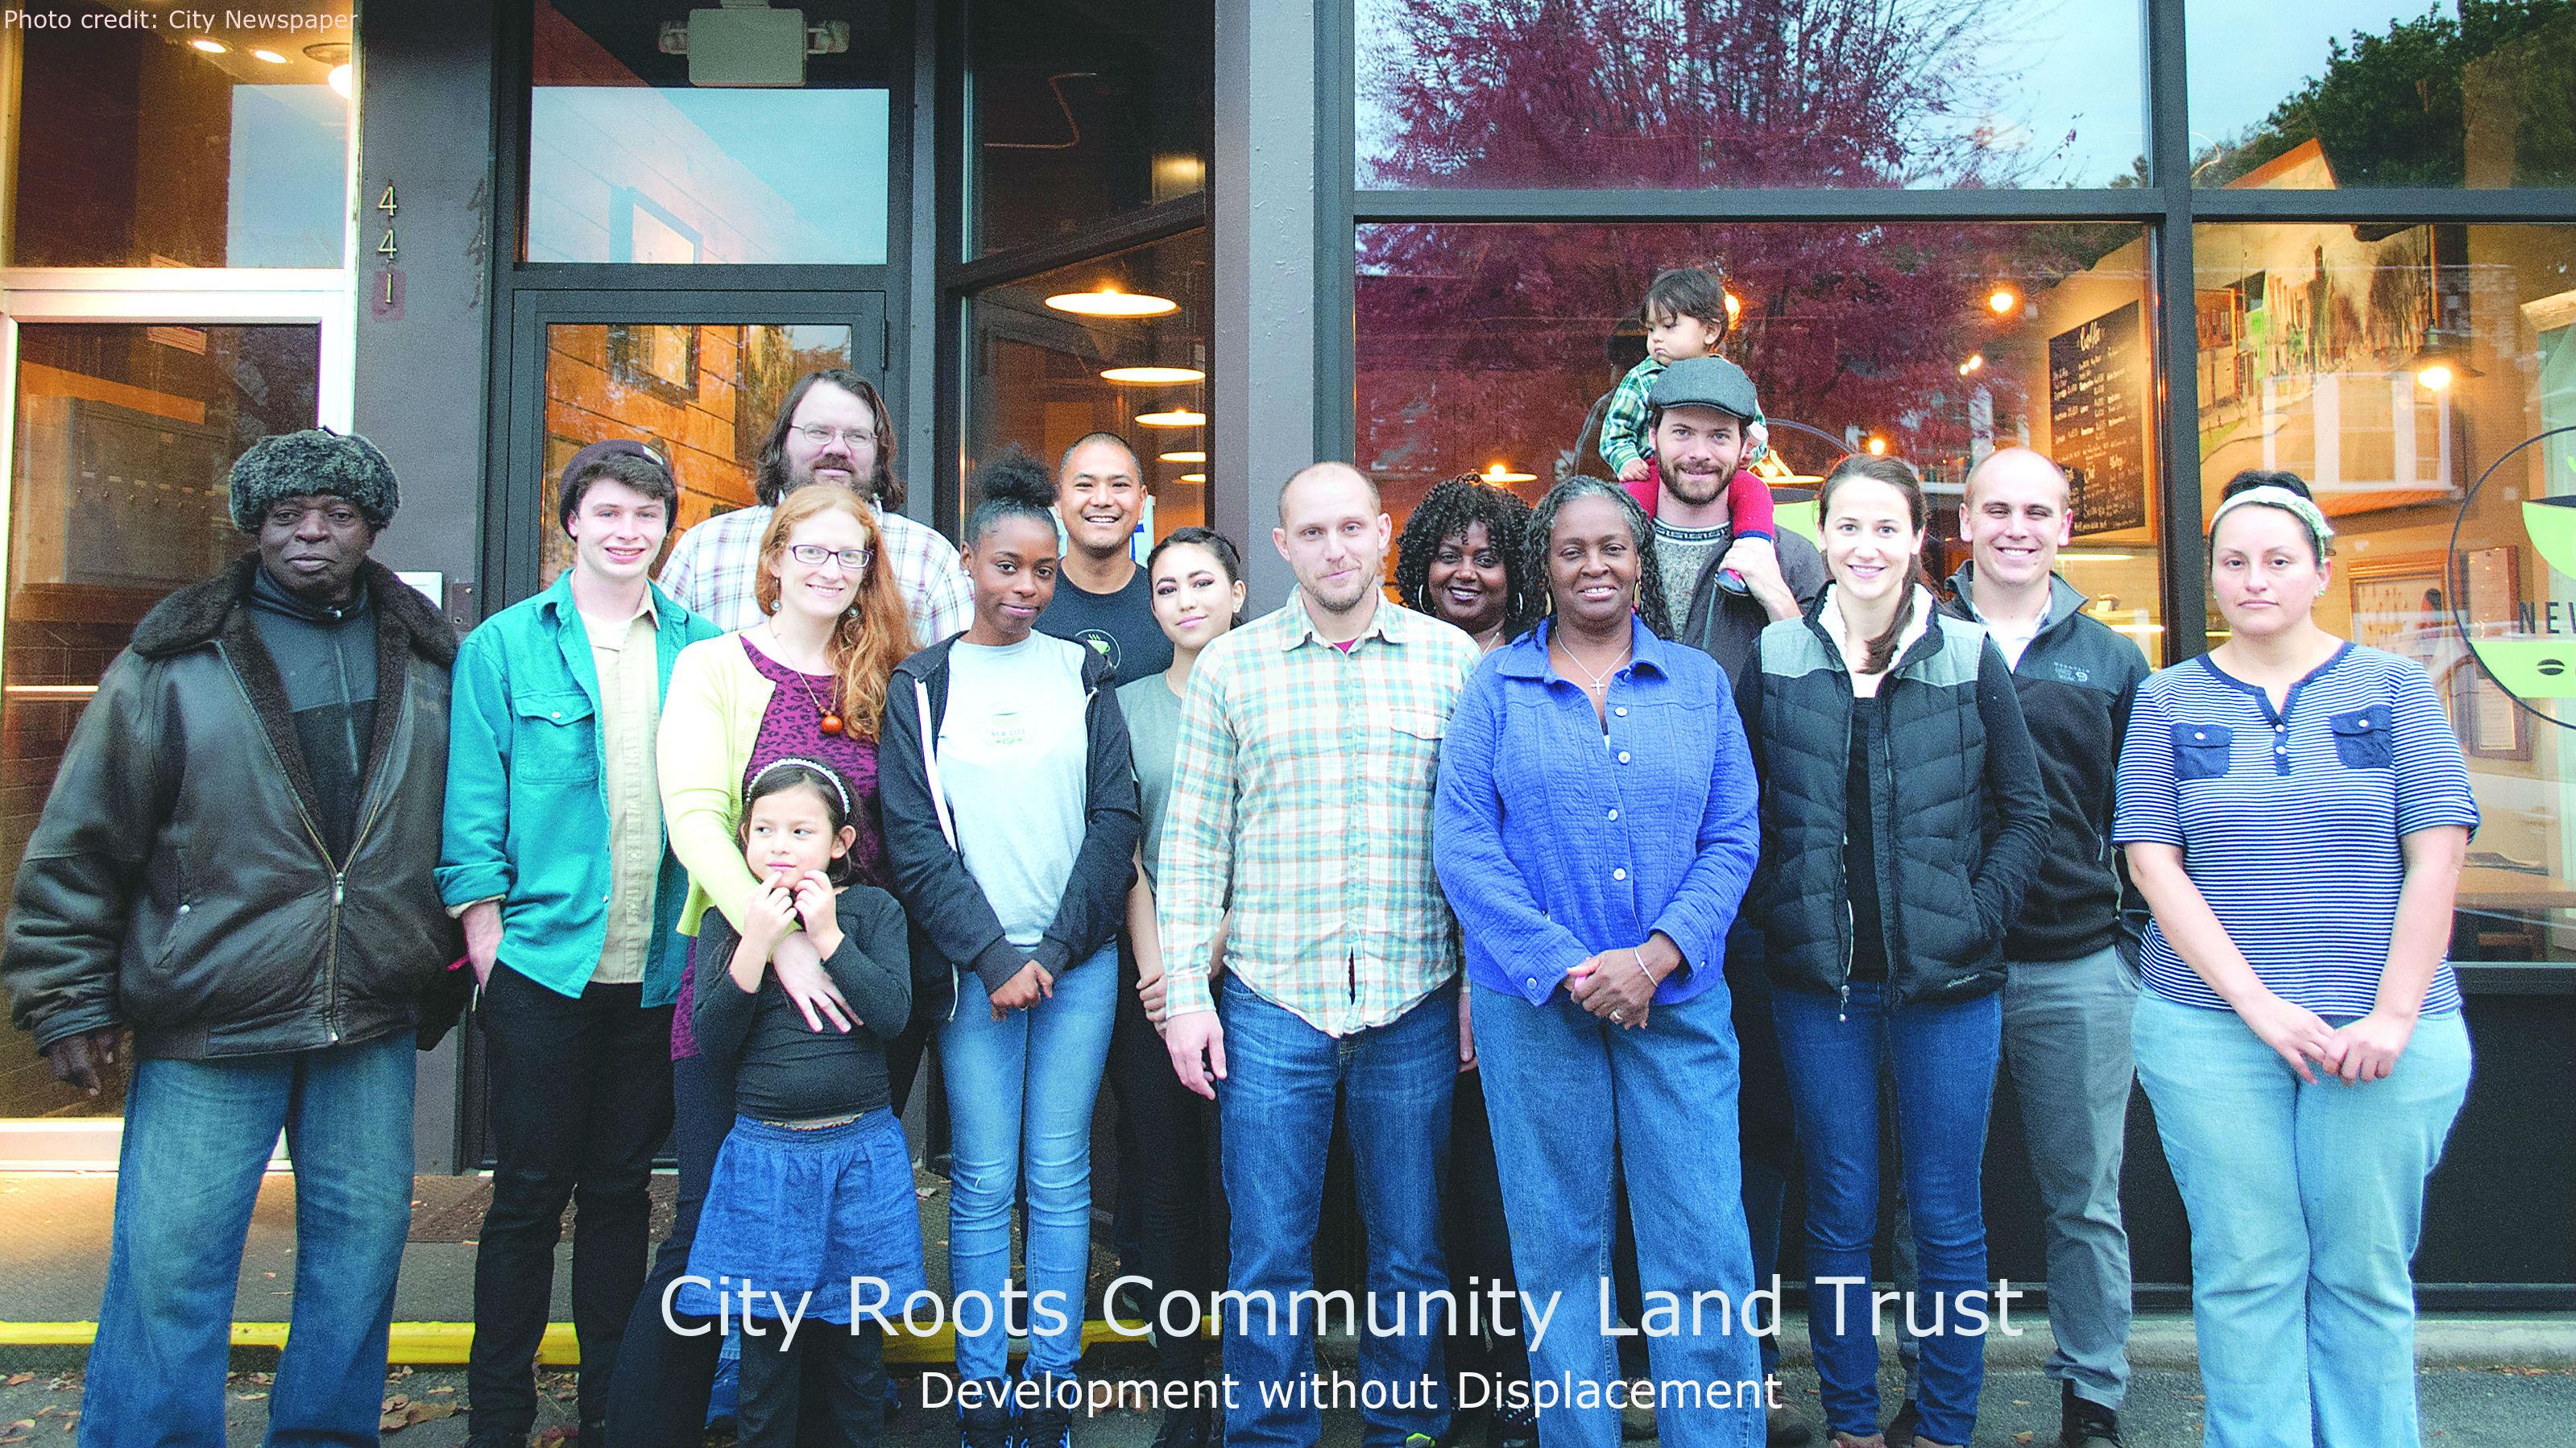 City Roots: LFC Members in City Newspaper